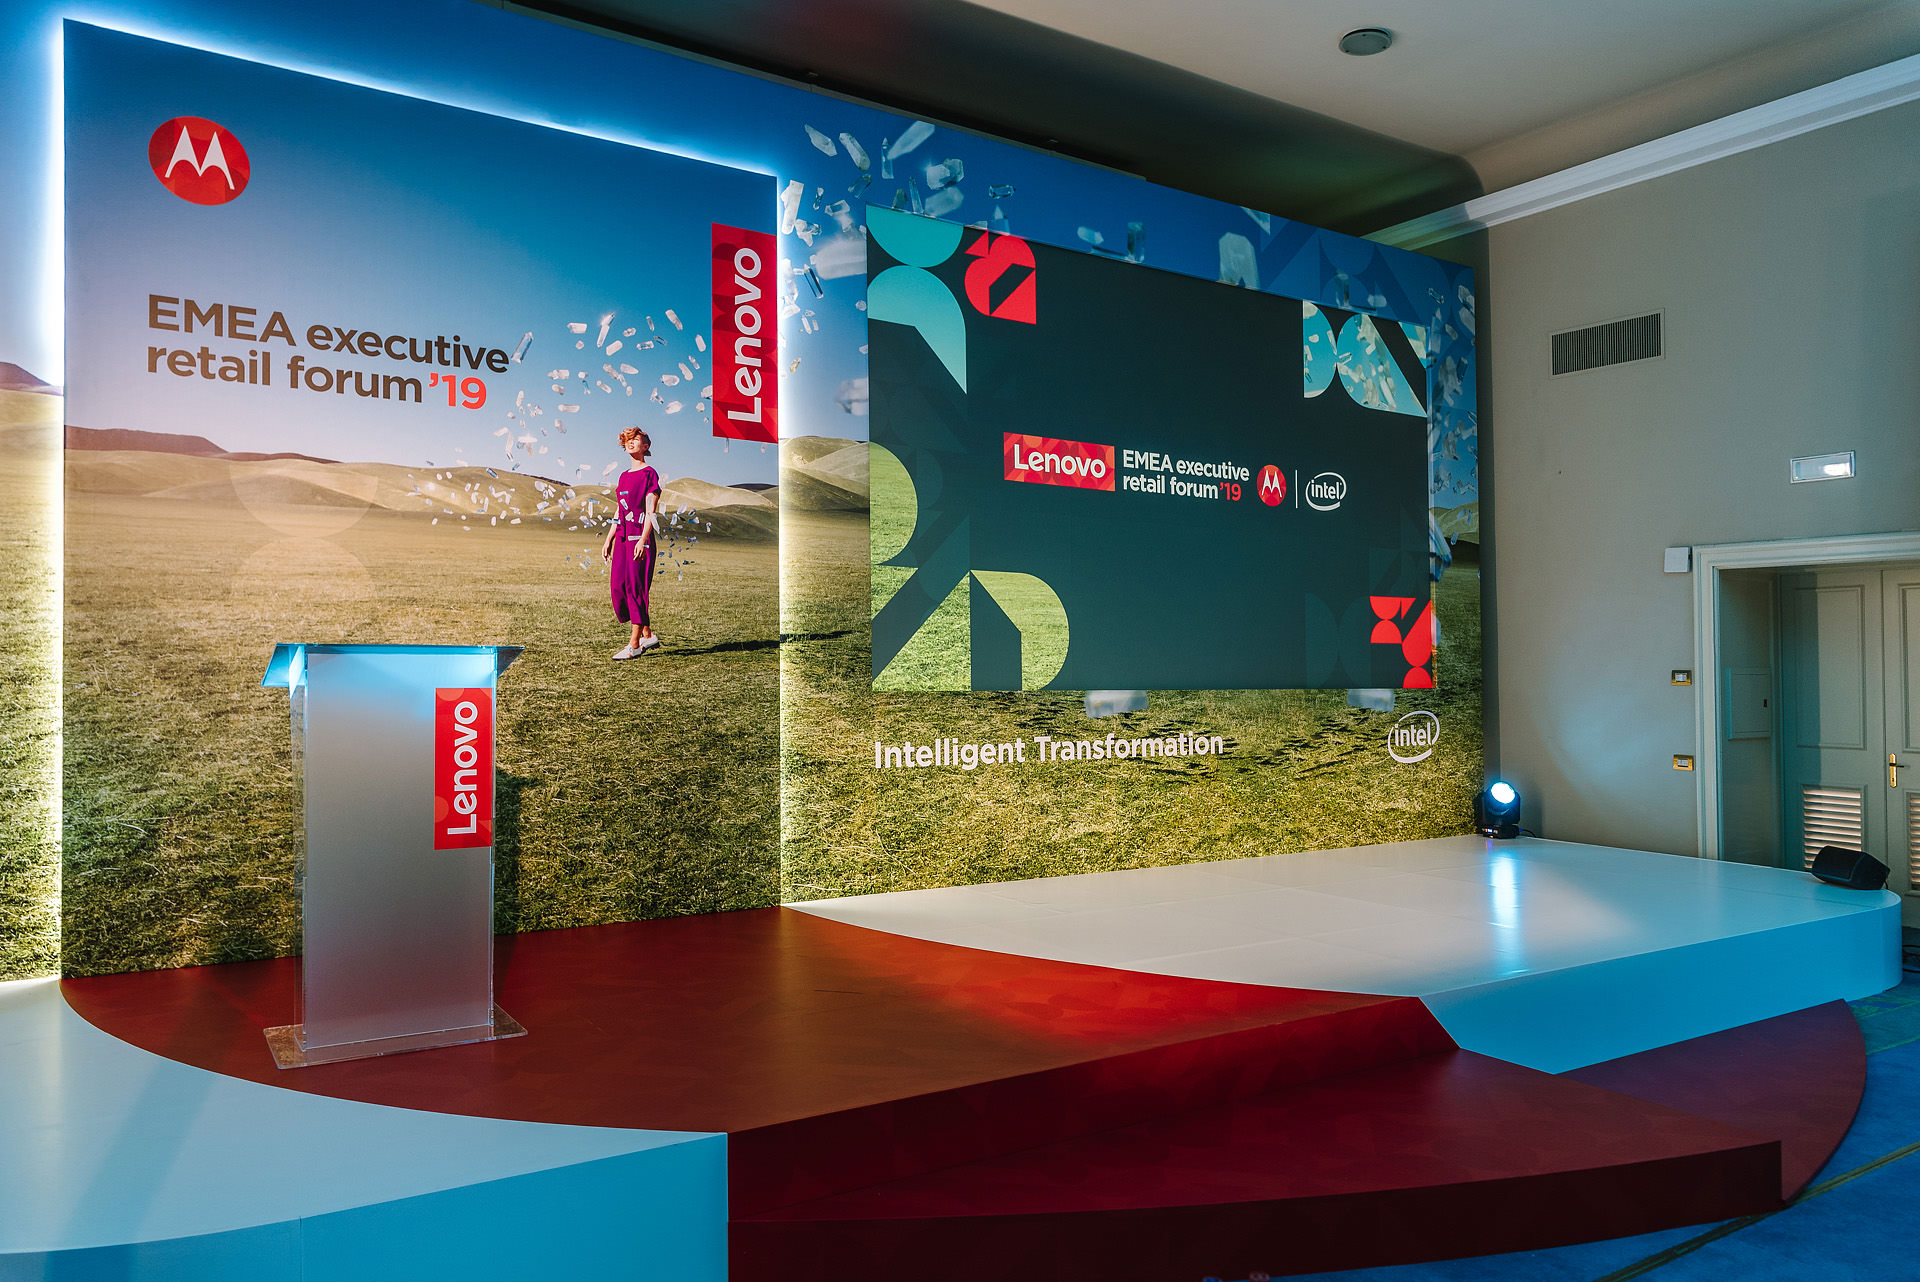 emea-executive-retail-forum-gruppo-peroni-eventi-05